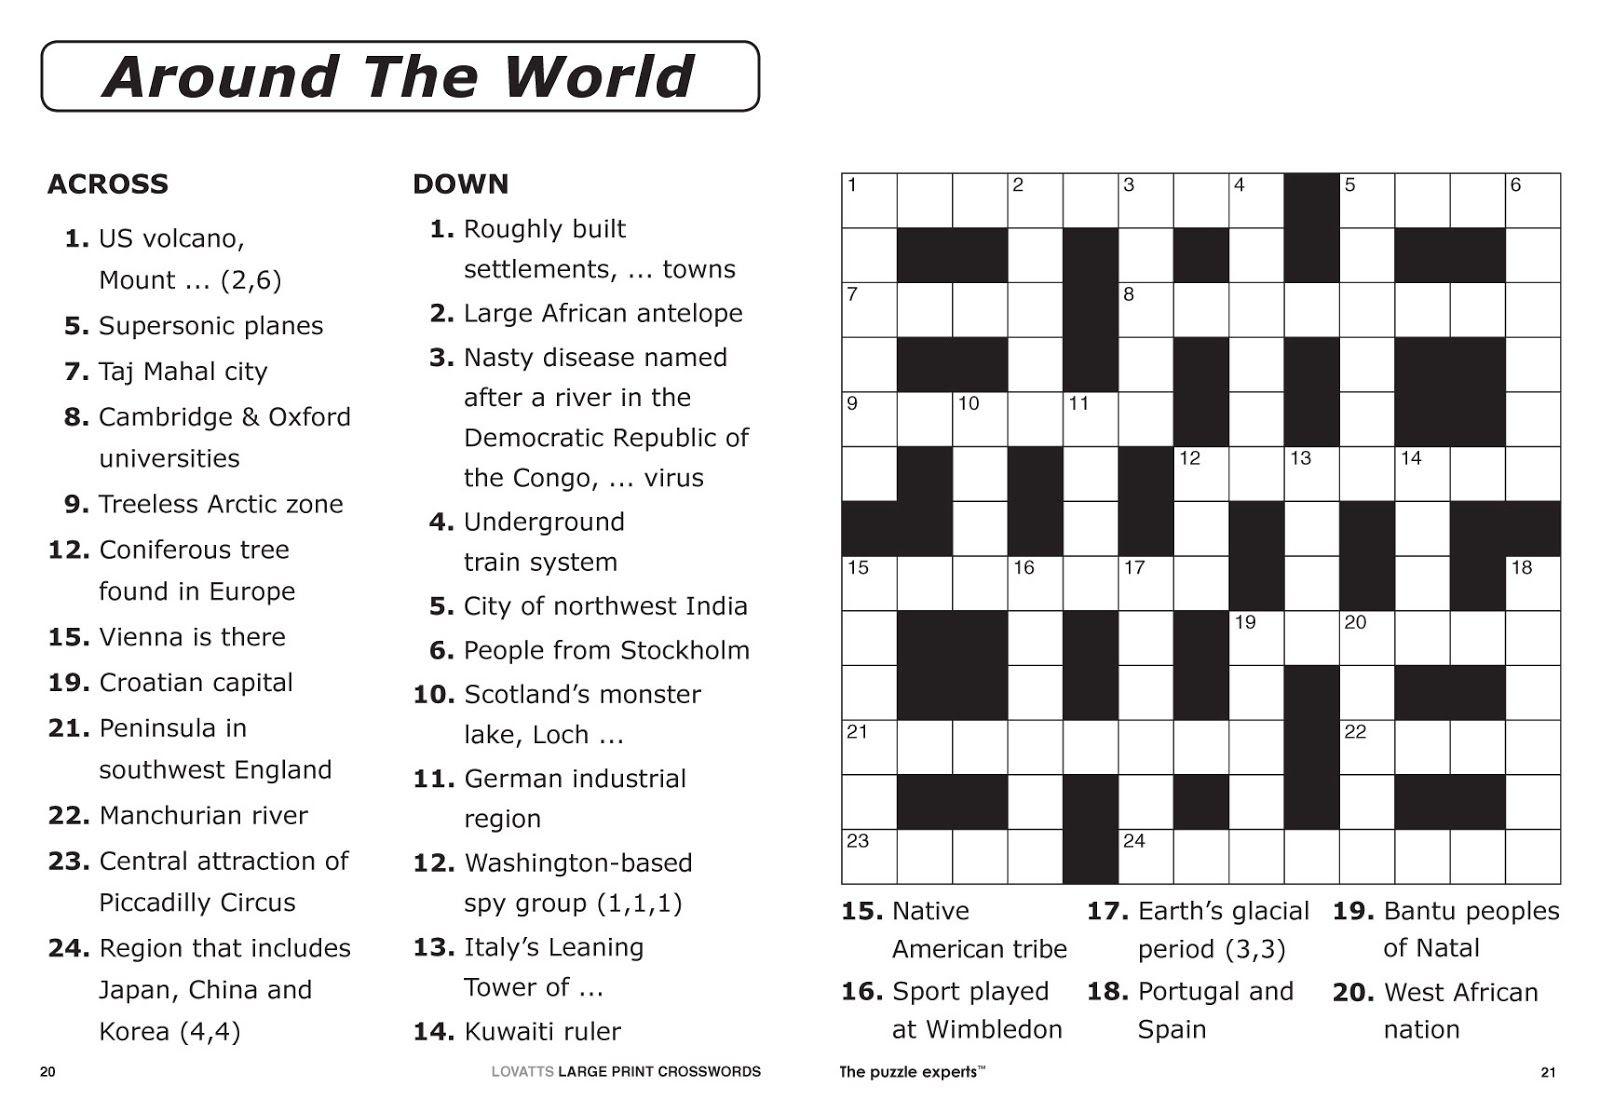 Free Printable Large Print Crossword Puzzles | M3U8 - Printable People Crossword Puzzles